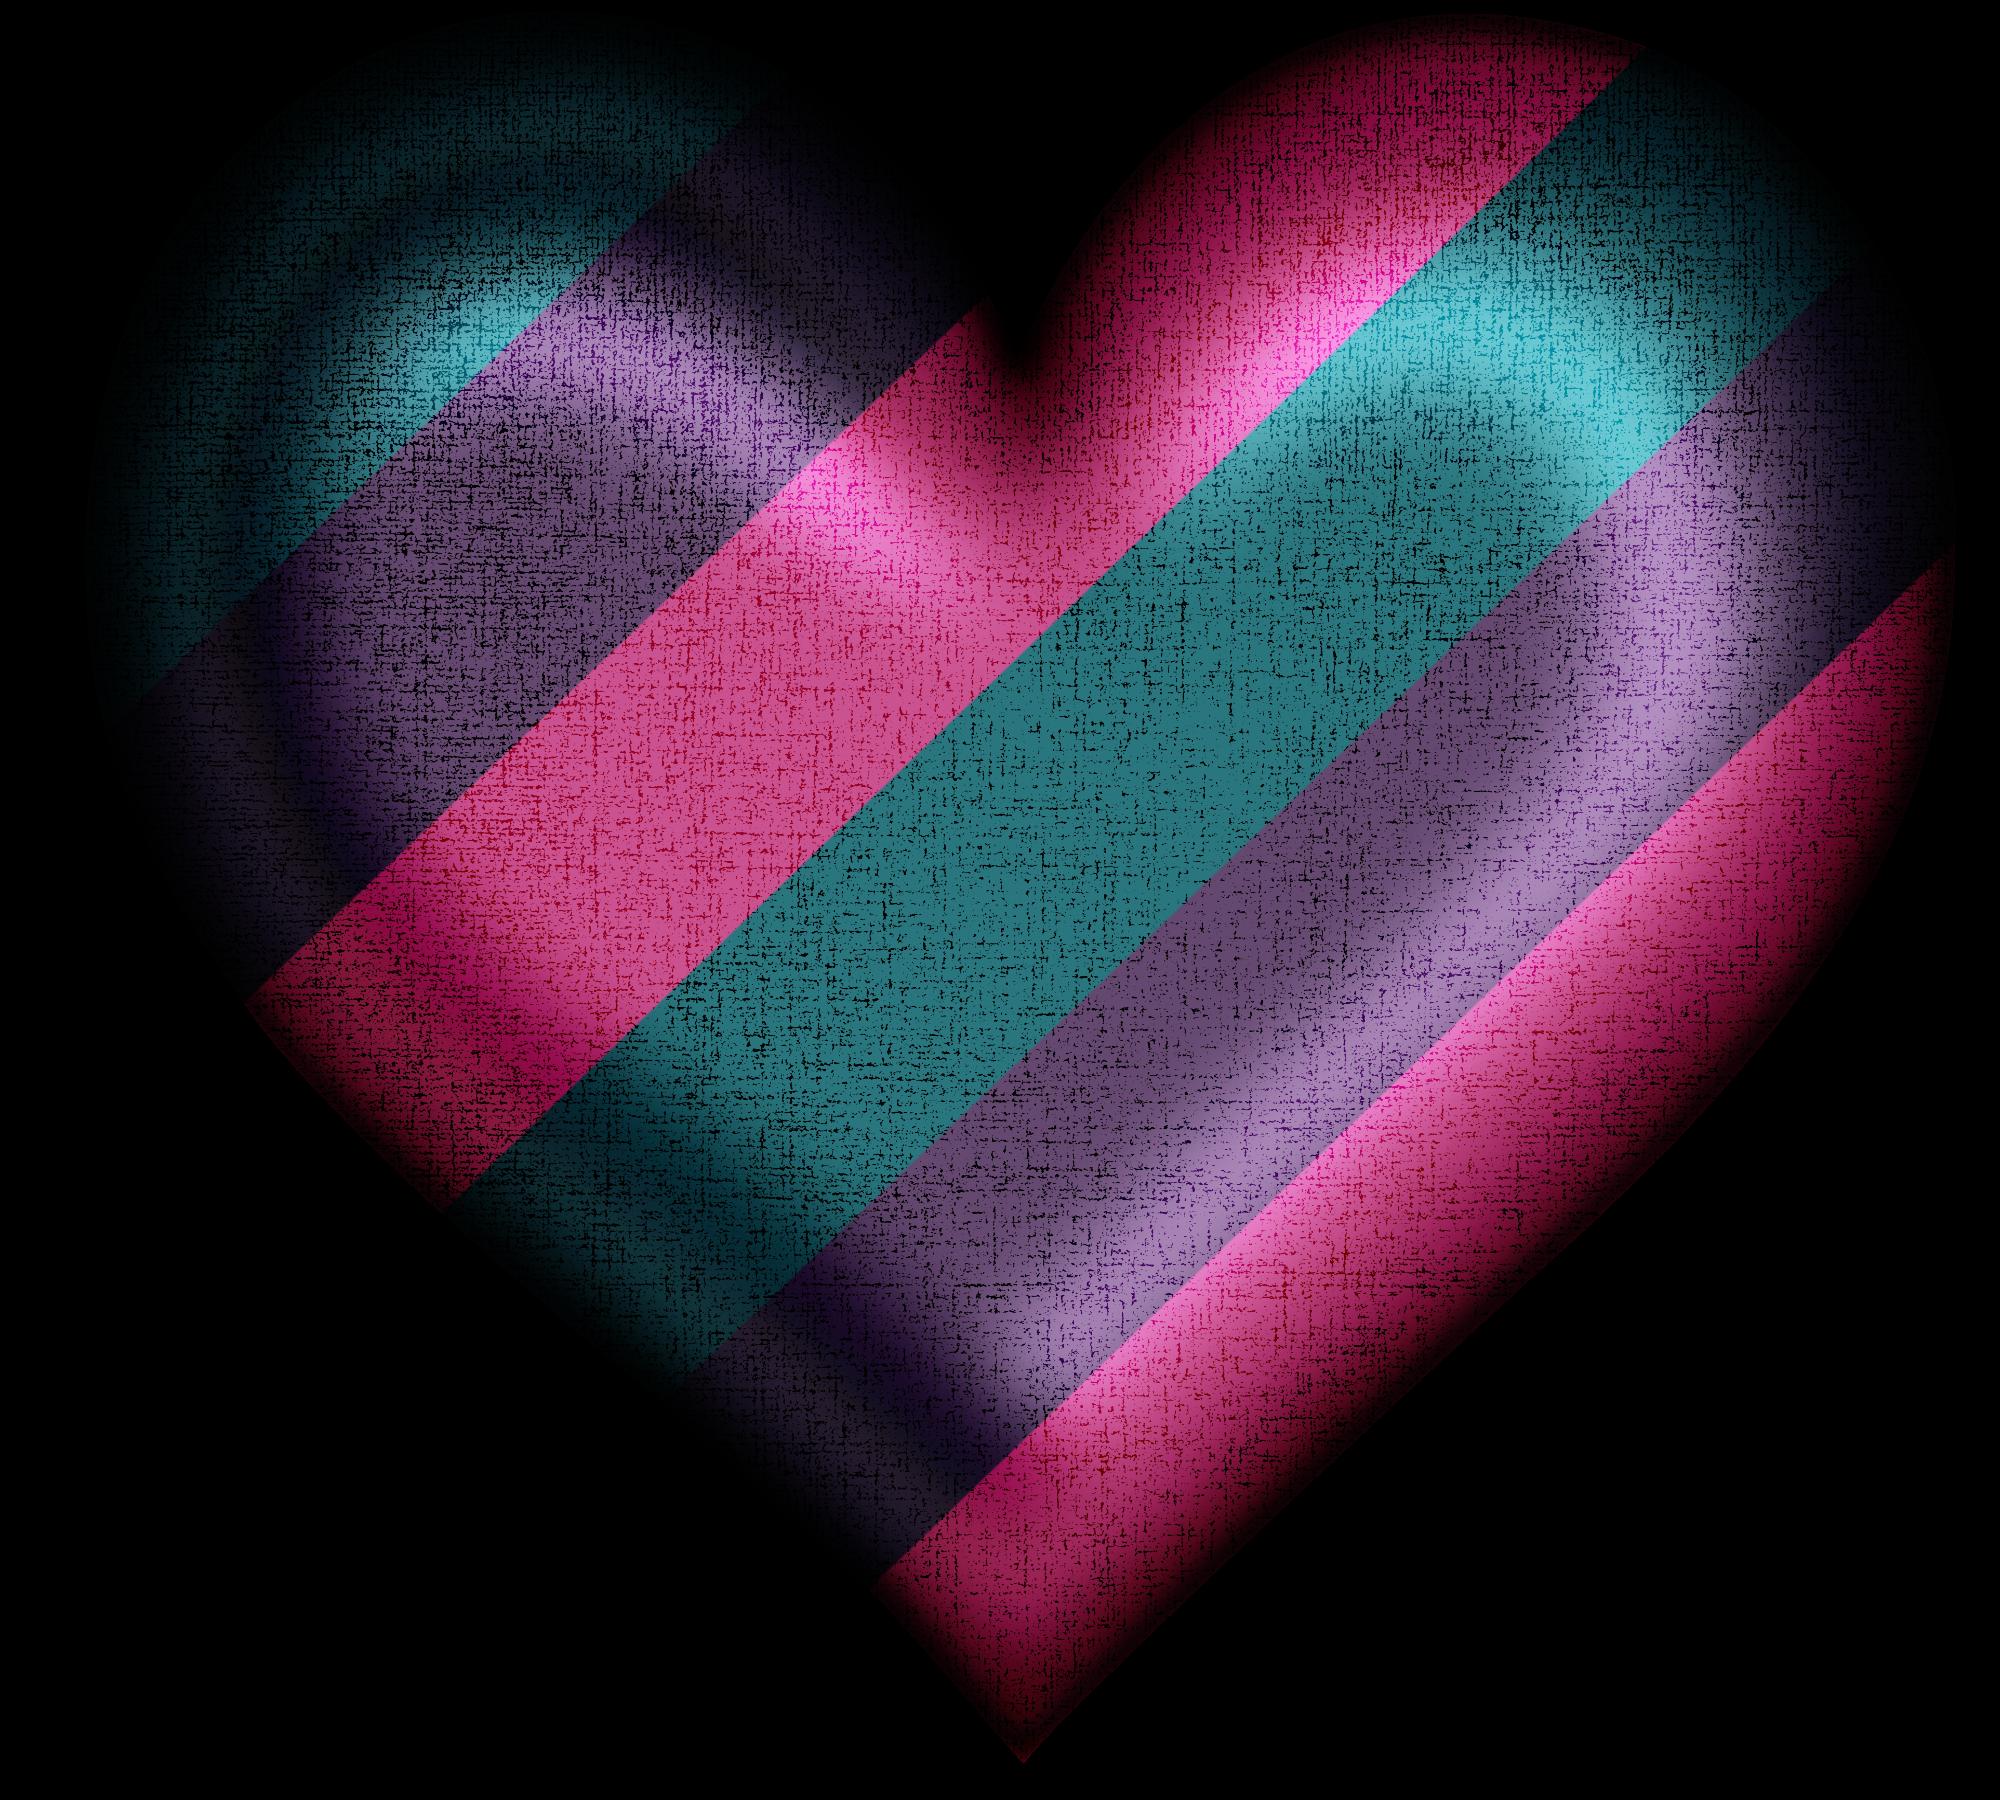 Pin by شريهان مجدى on love Heart wallpaper, Heart icons